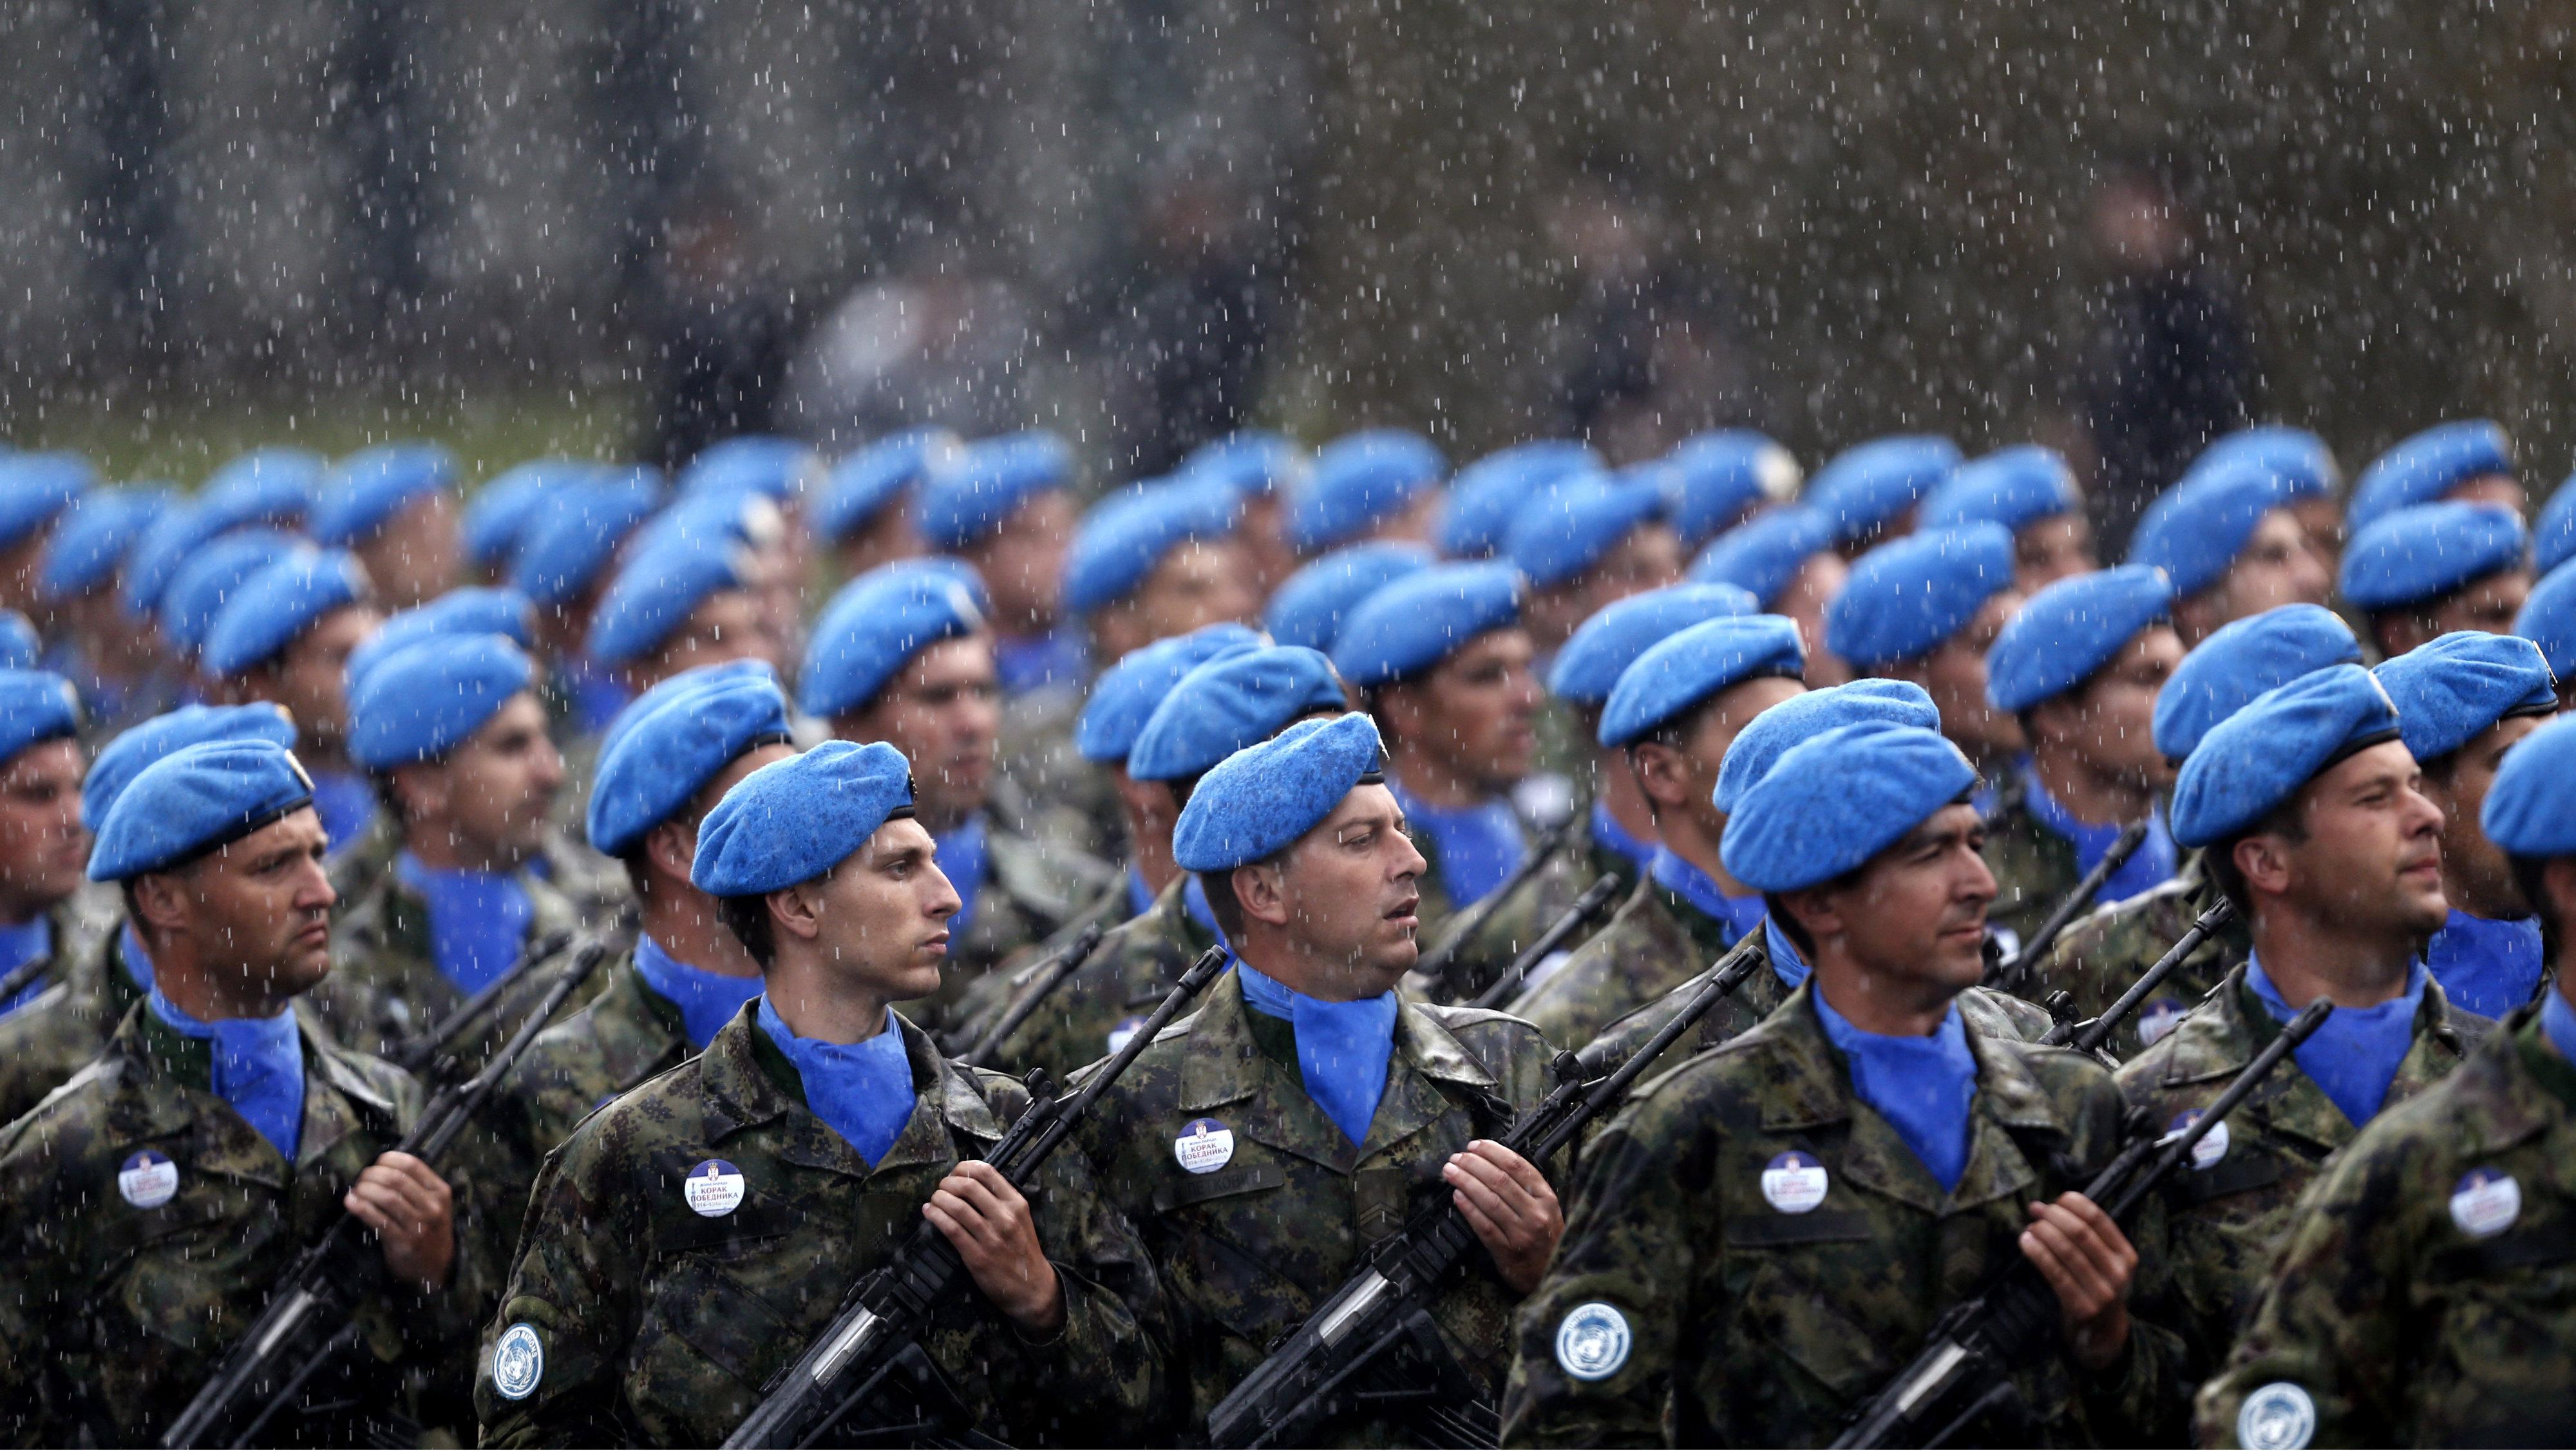 Serbian army marching